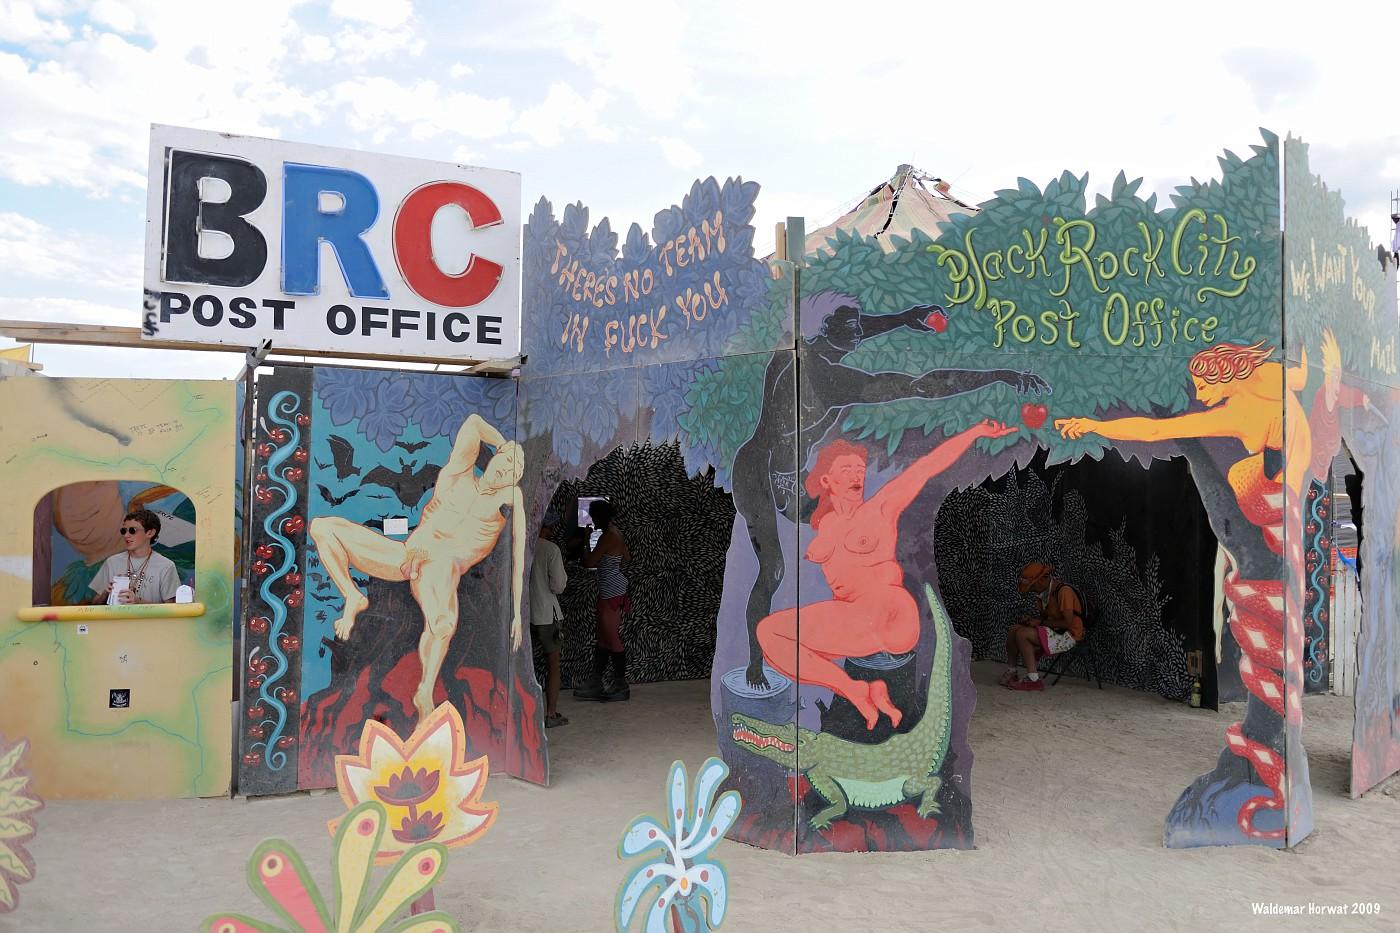 BRC Post Office